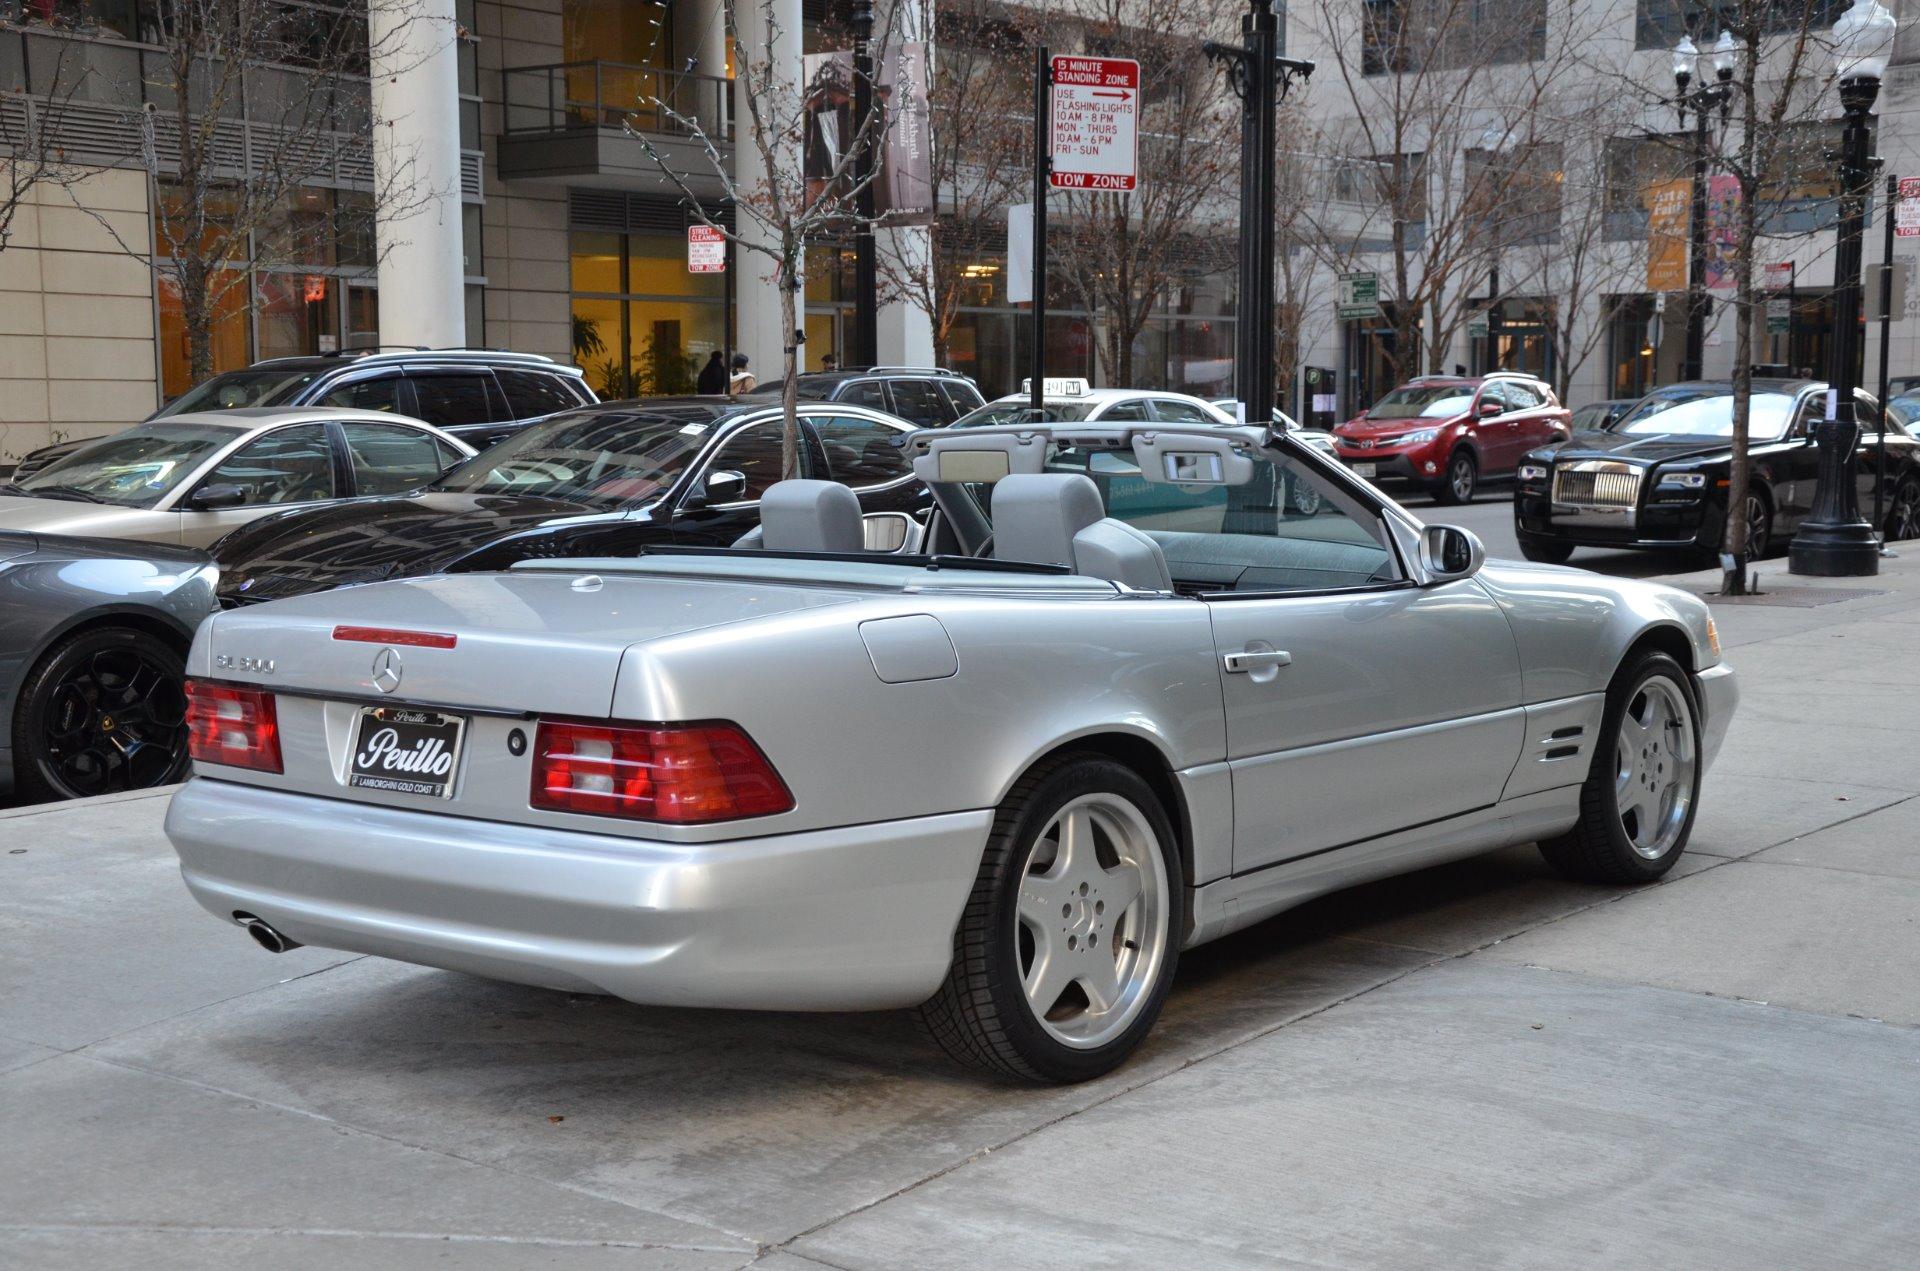 2002 mercedes benz sl class sl 500 stock gc tucker4 for for Chicago mercedes benz dealer